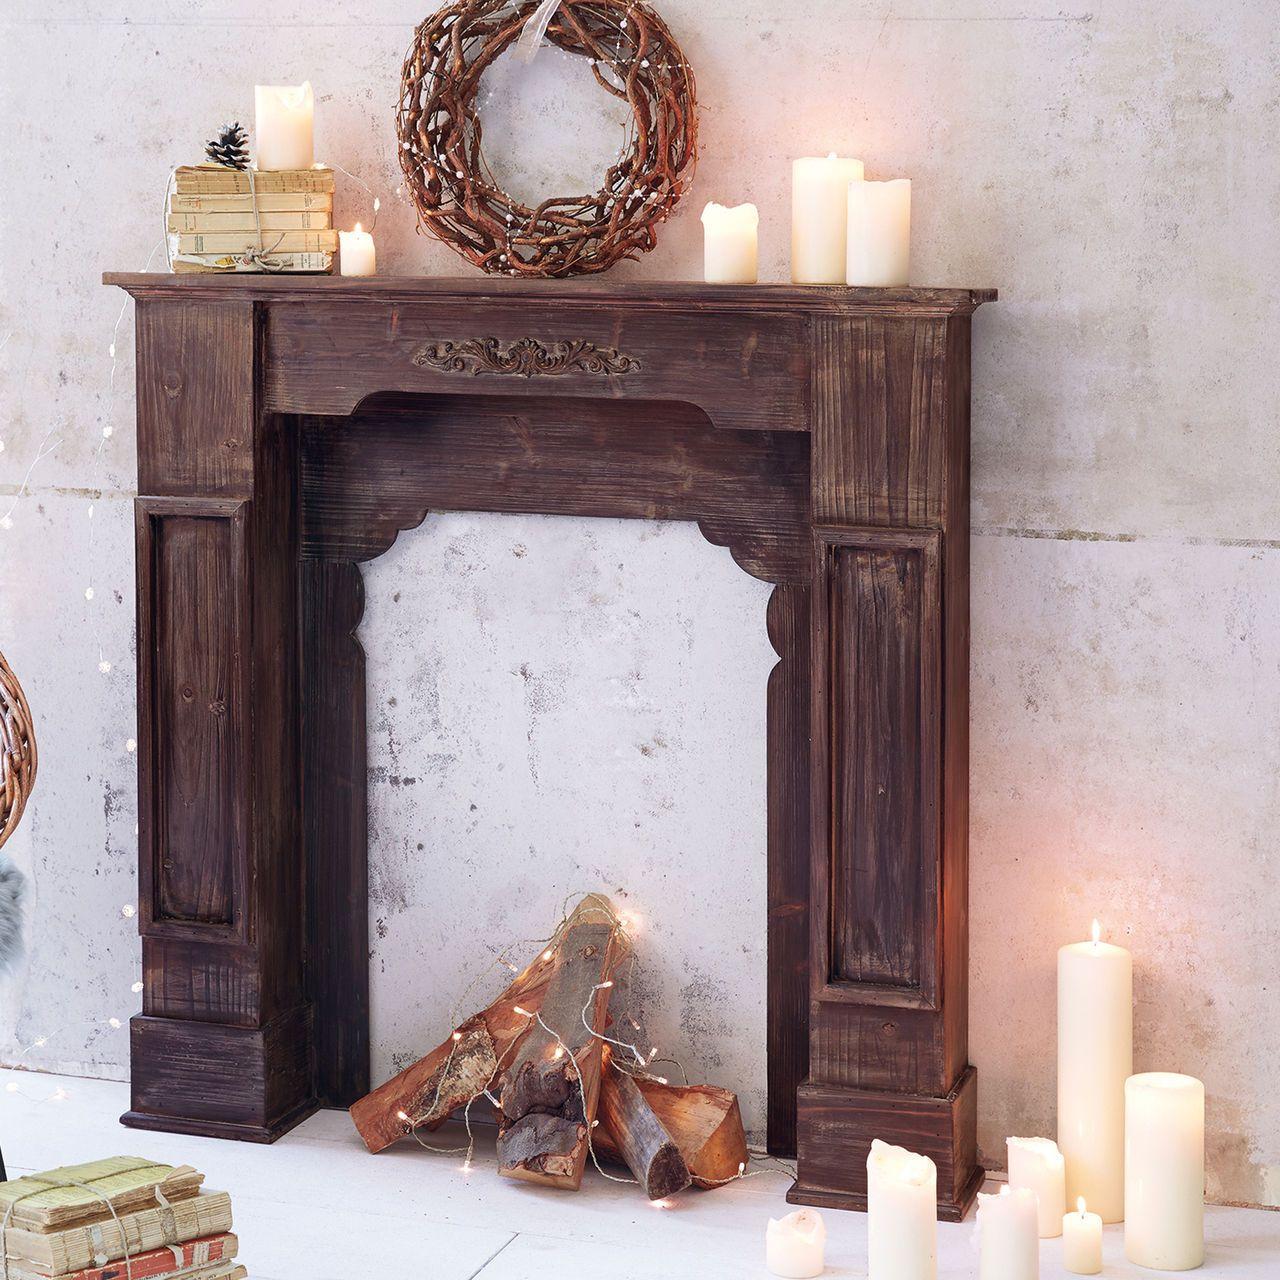 dekorative kaminumrandung aus gemasertem tannenholz